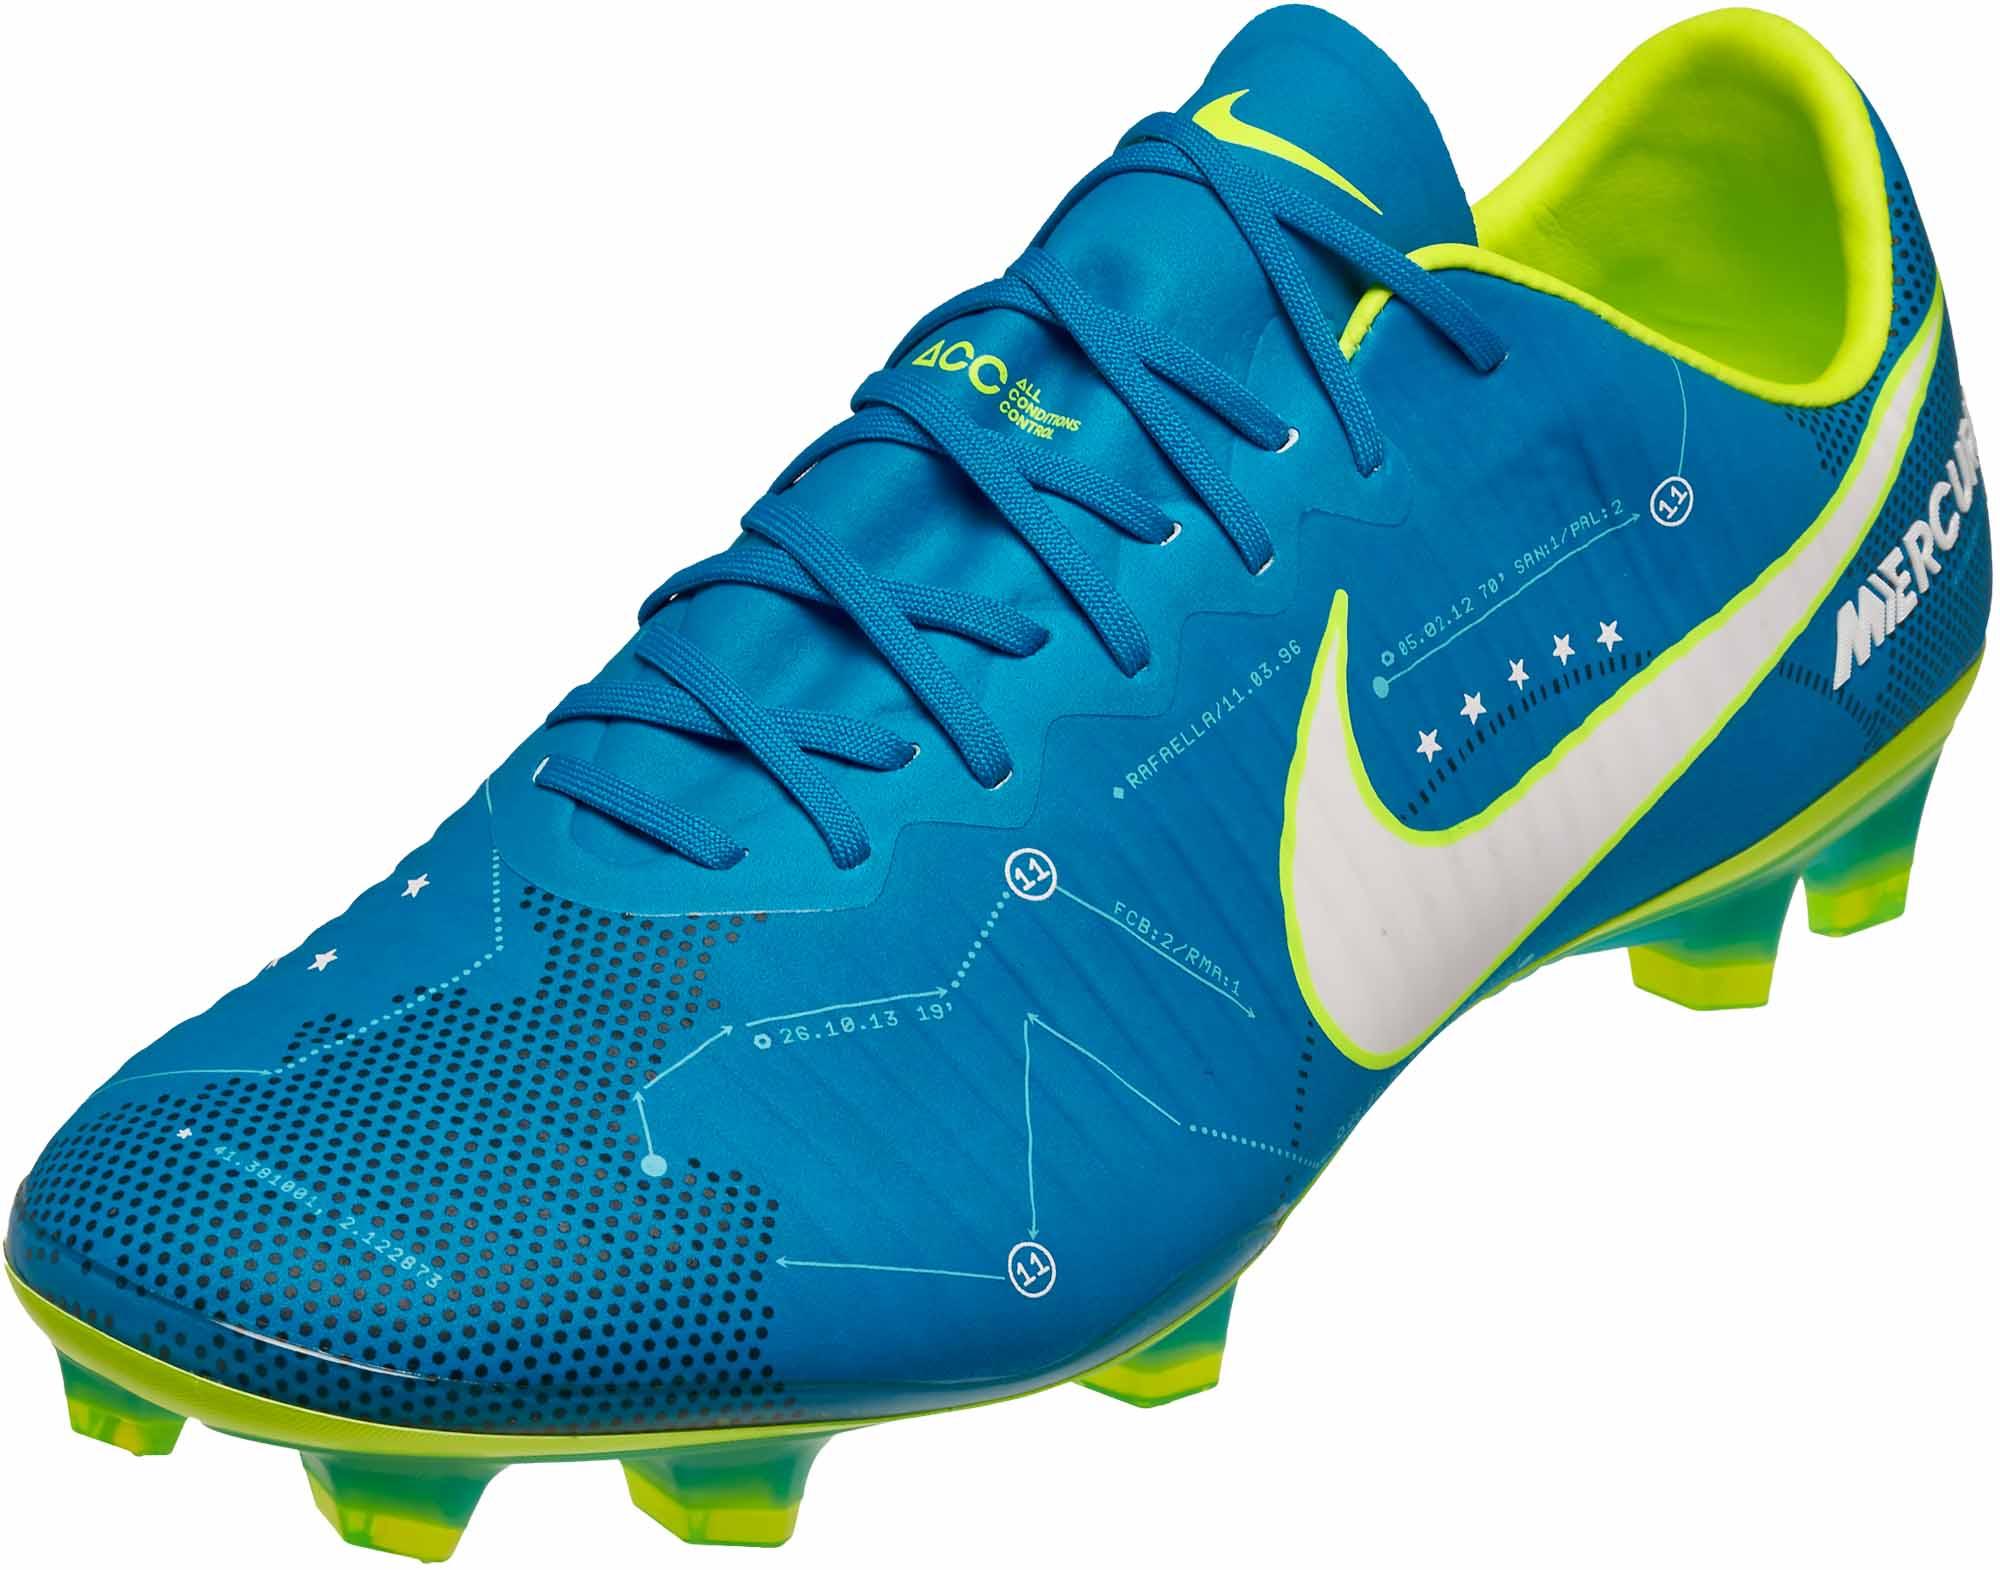 Nike Vapor Indoor Turf Shoes